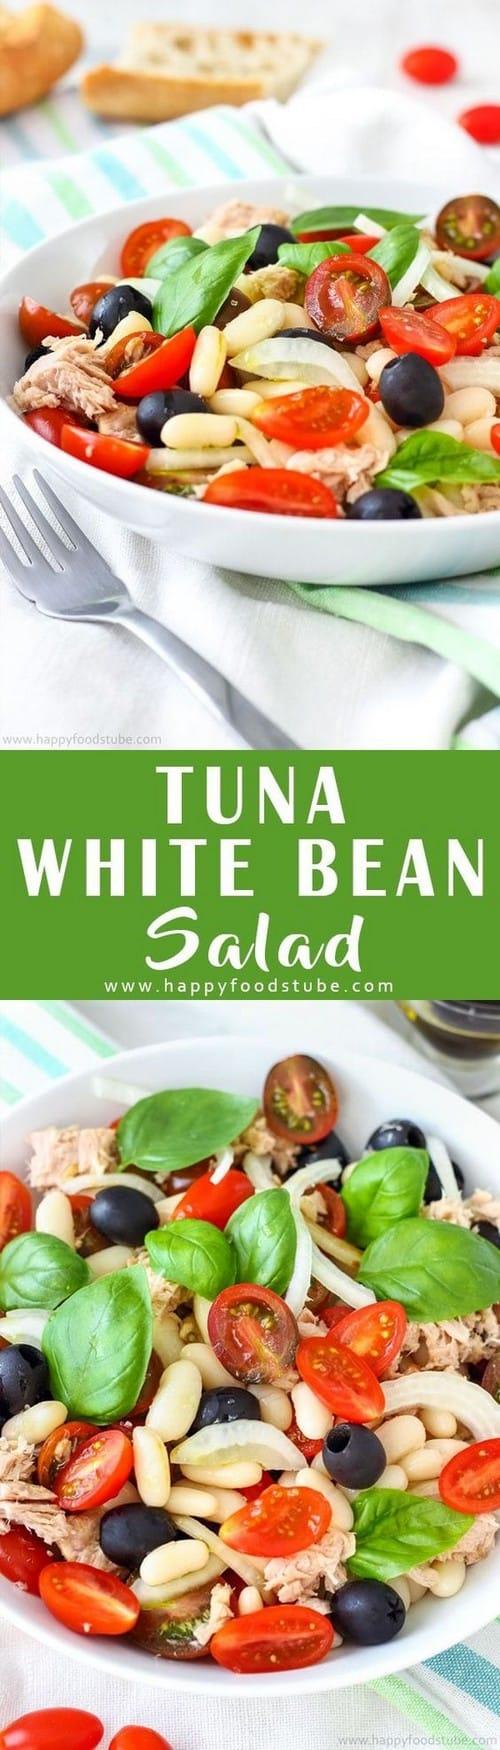 Mediterranean Tuna White Bean Salad